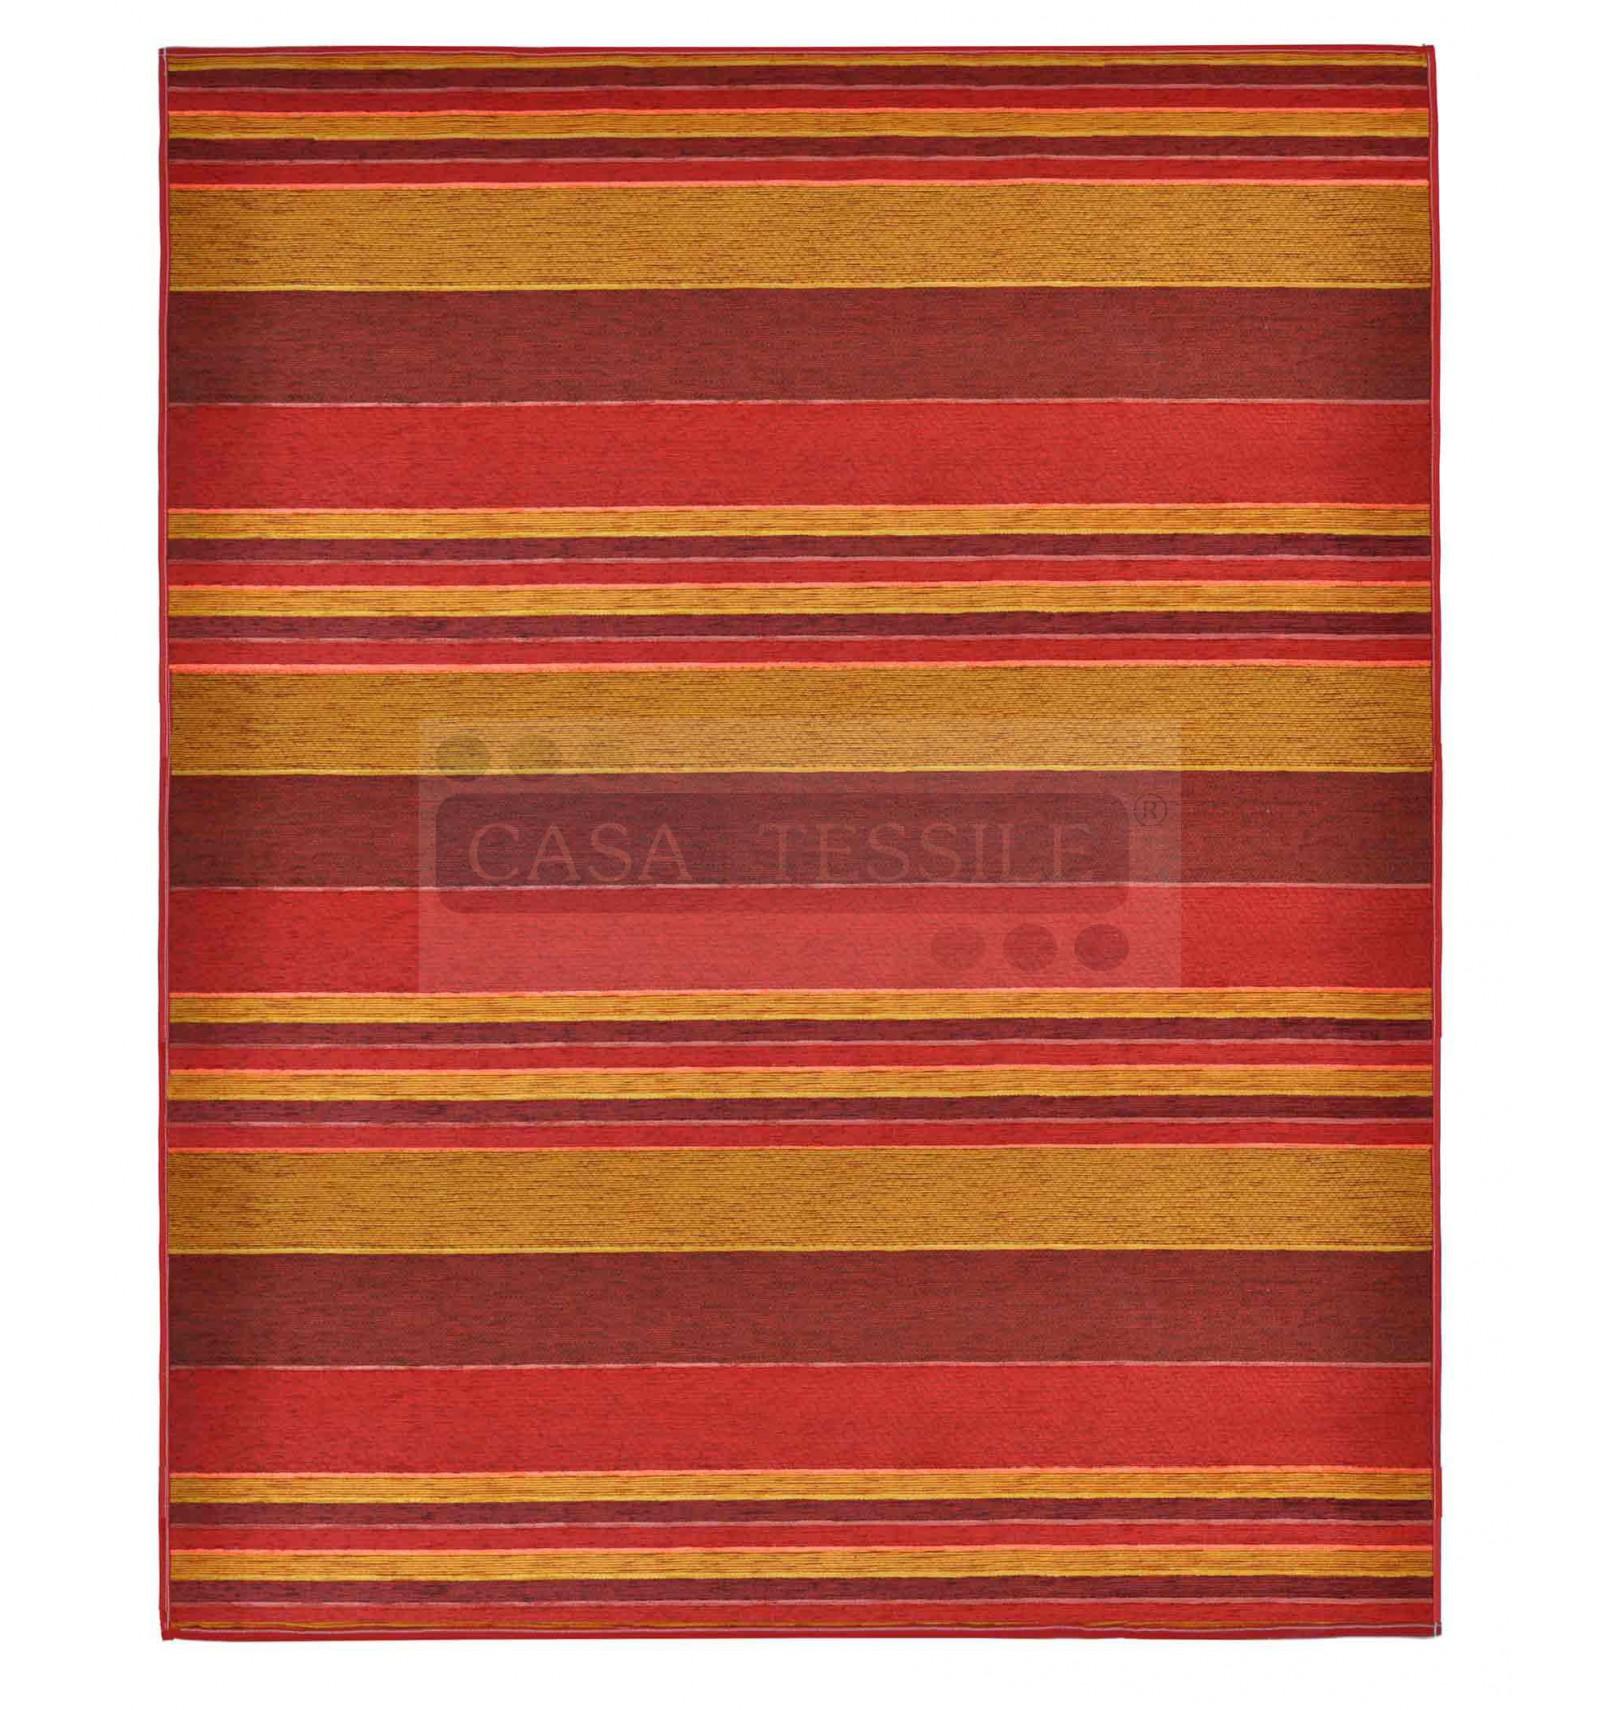 Lebandes tappeto sala 160x230 cm casa tessile - Tappeto 160x230 ...